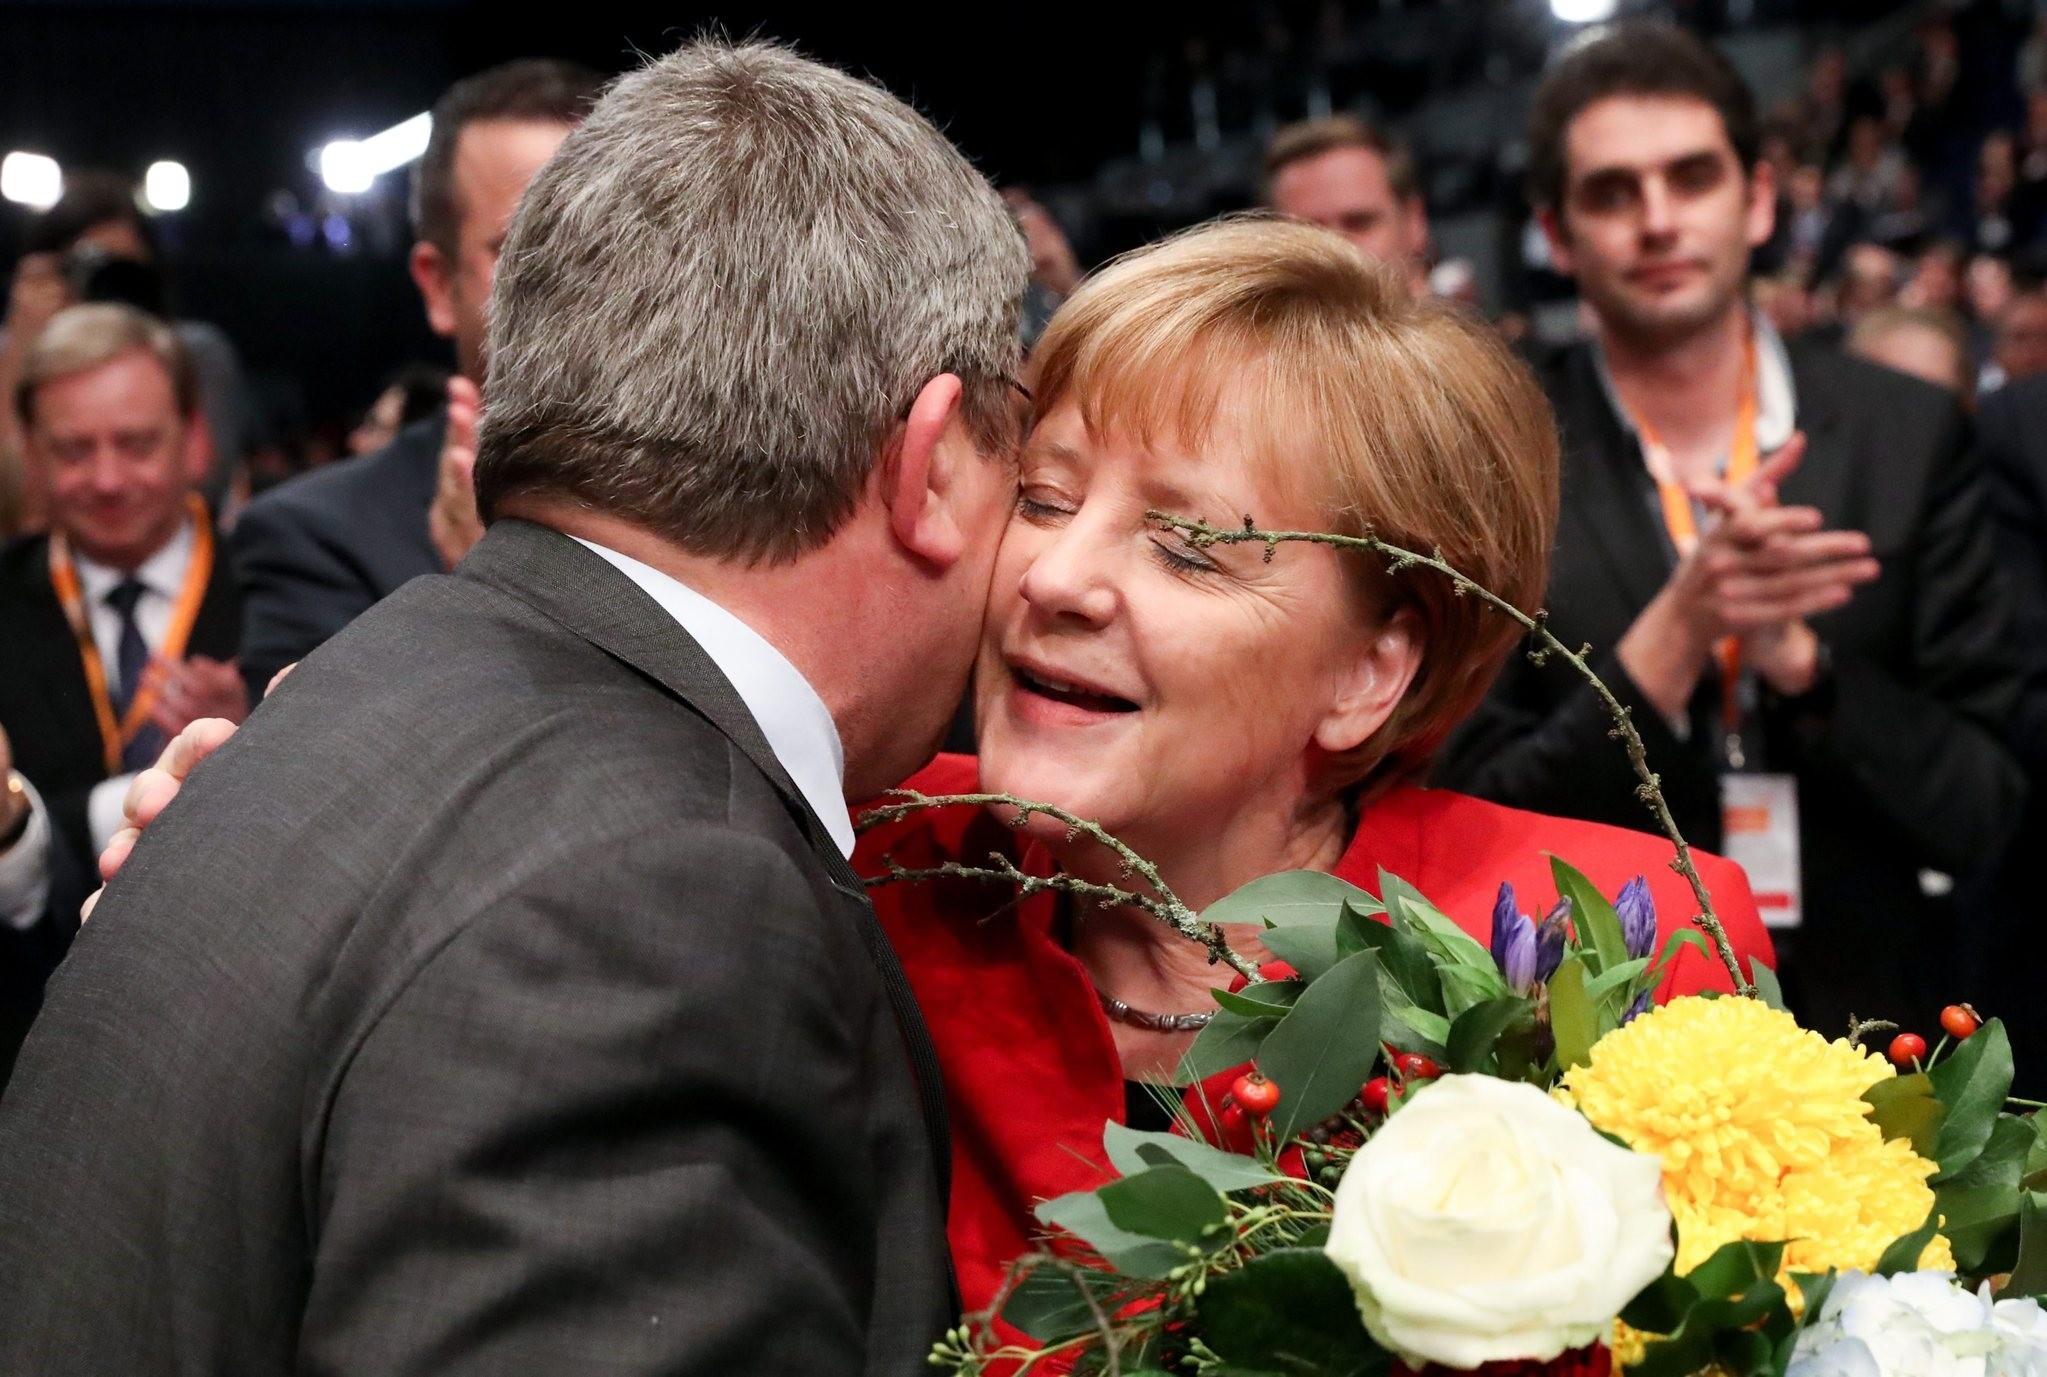 The Interior Minister of the German state of Mecklenburg-Western Pomerania Lorenz Caffier (L) congratulates German Chancellor Merkel. (AP Photo)